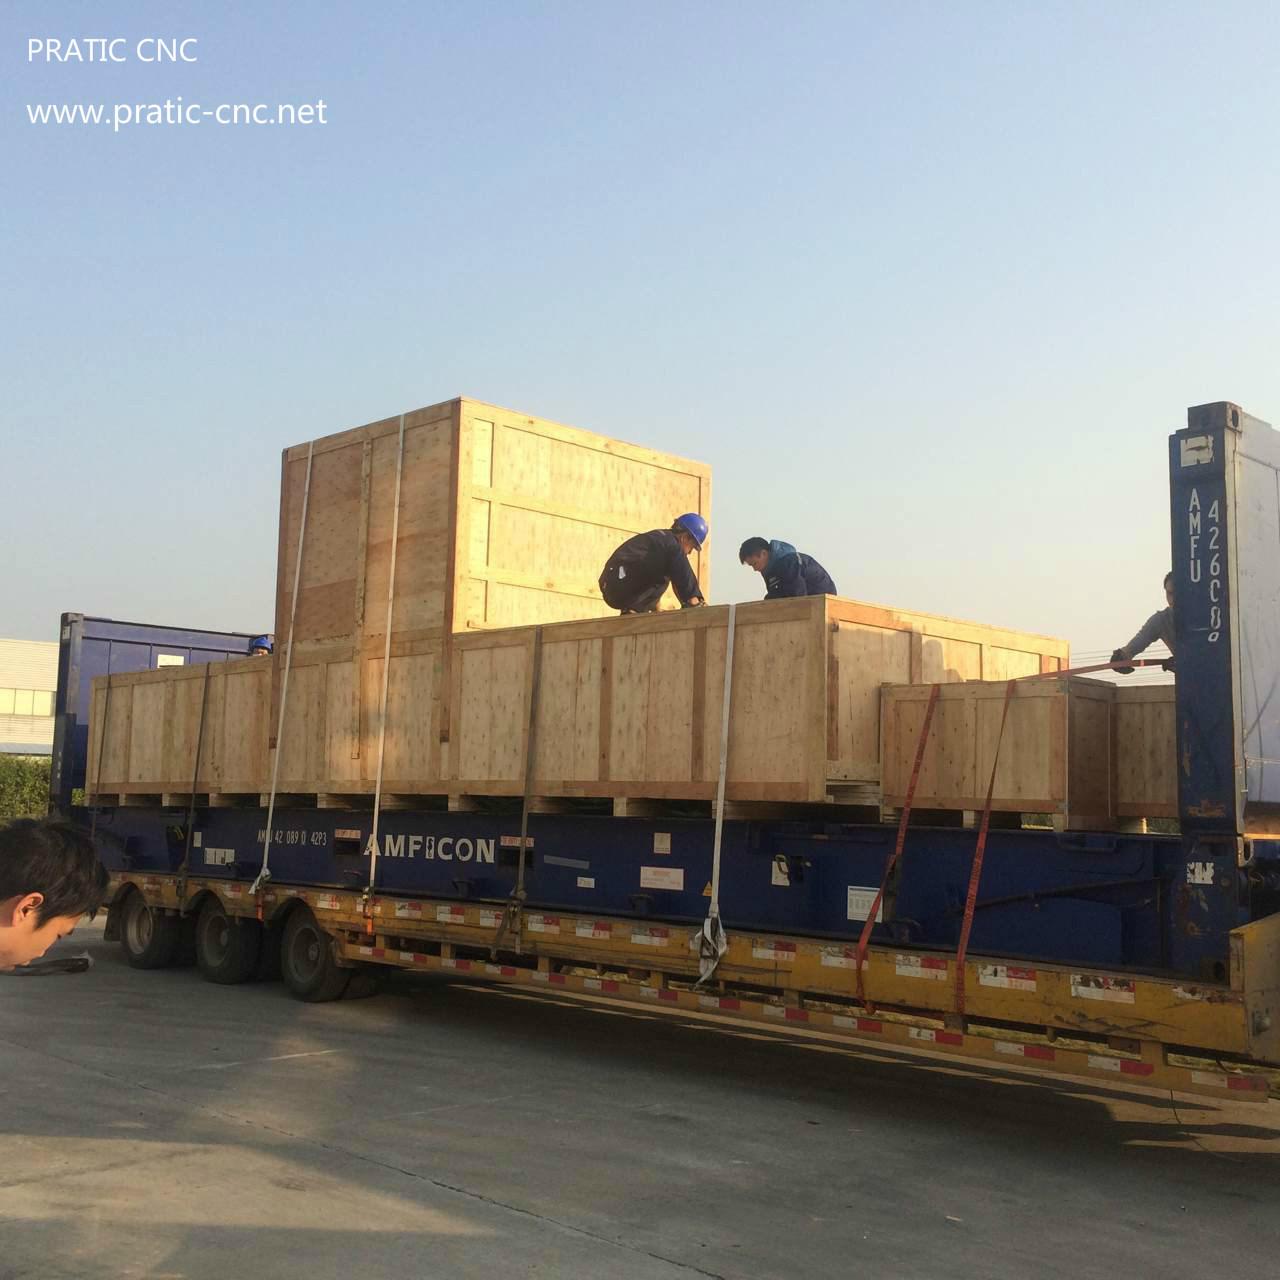 CNC Moving Colum Drilling Machine -PC Standard 3 Axes